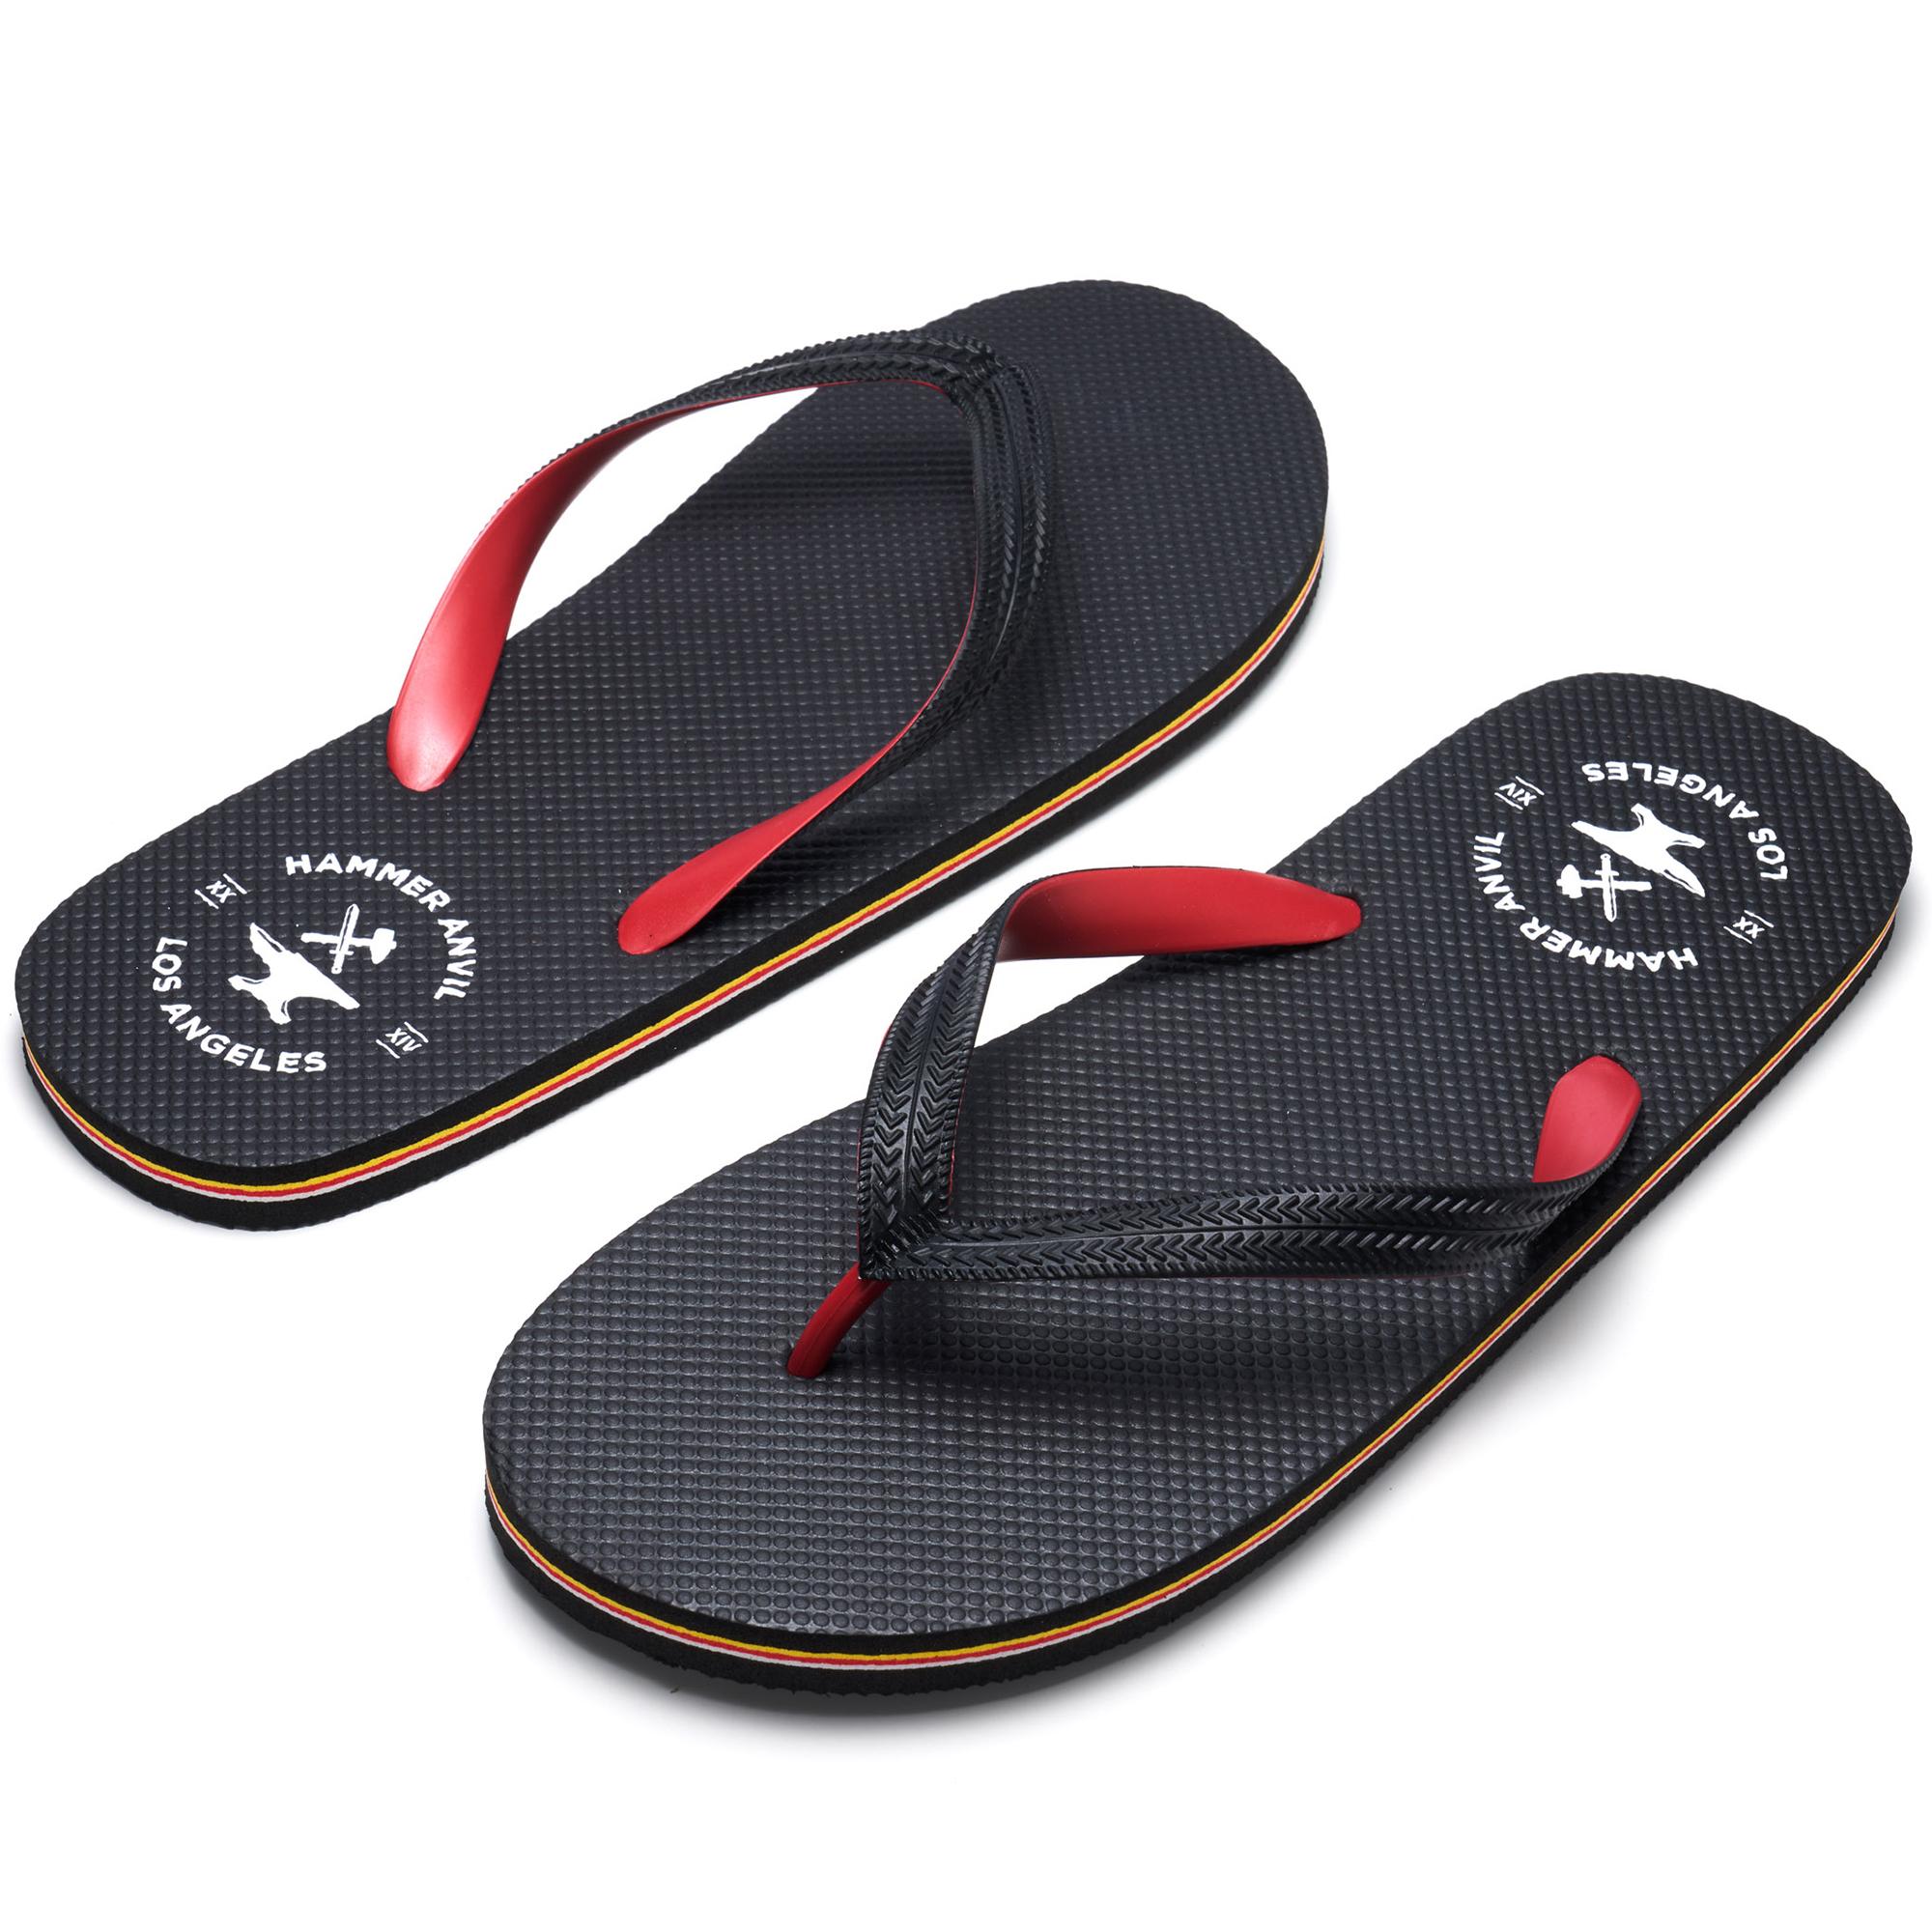 Hammer-Anvil-Mens-Flip-Flops-Casual-Thong-Summer-Sandals-Comfortable-Beach-Shoes thumbnail 32